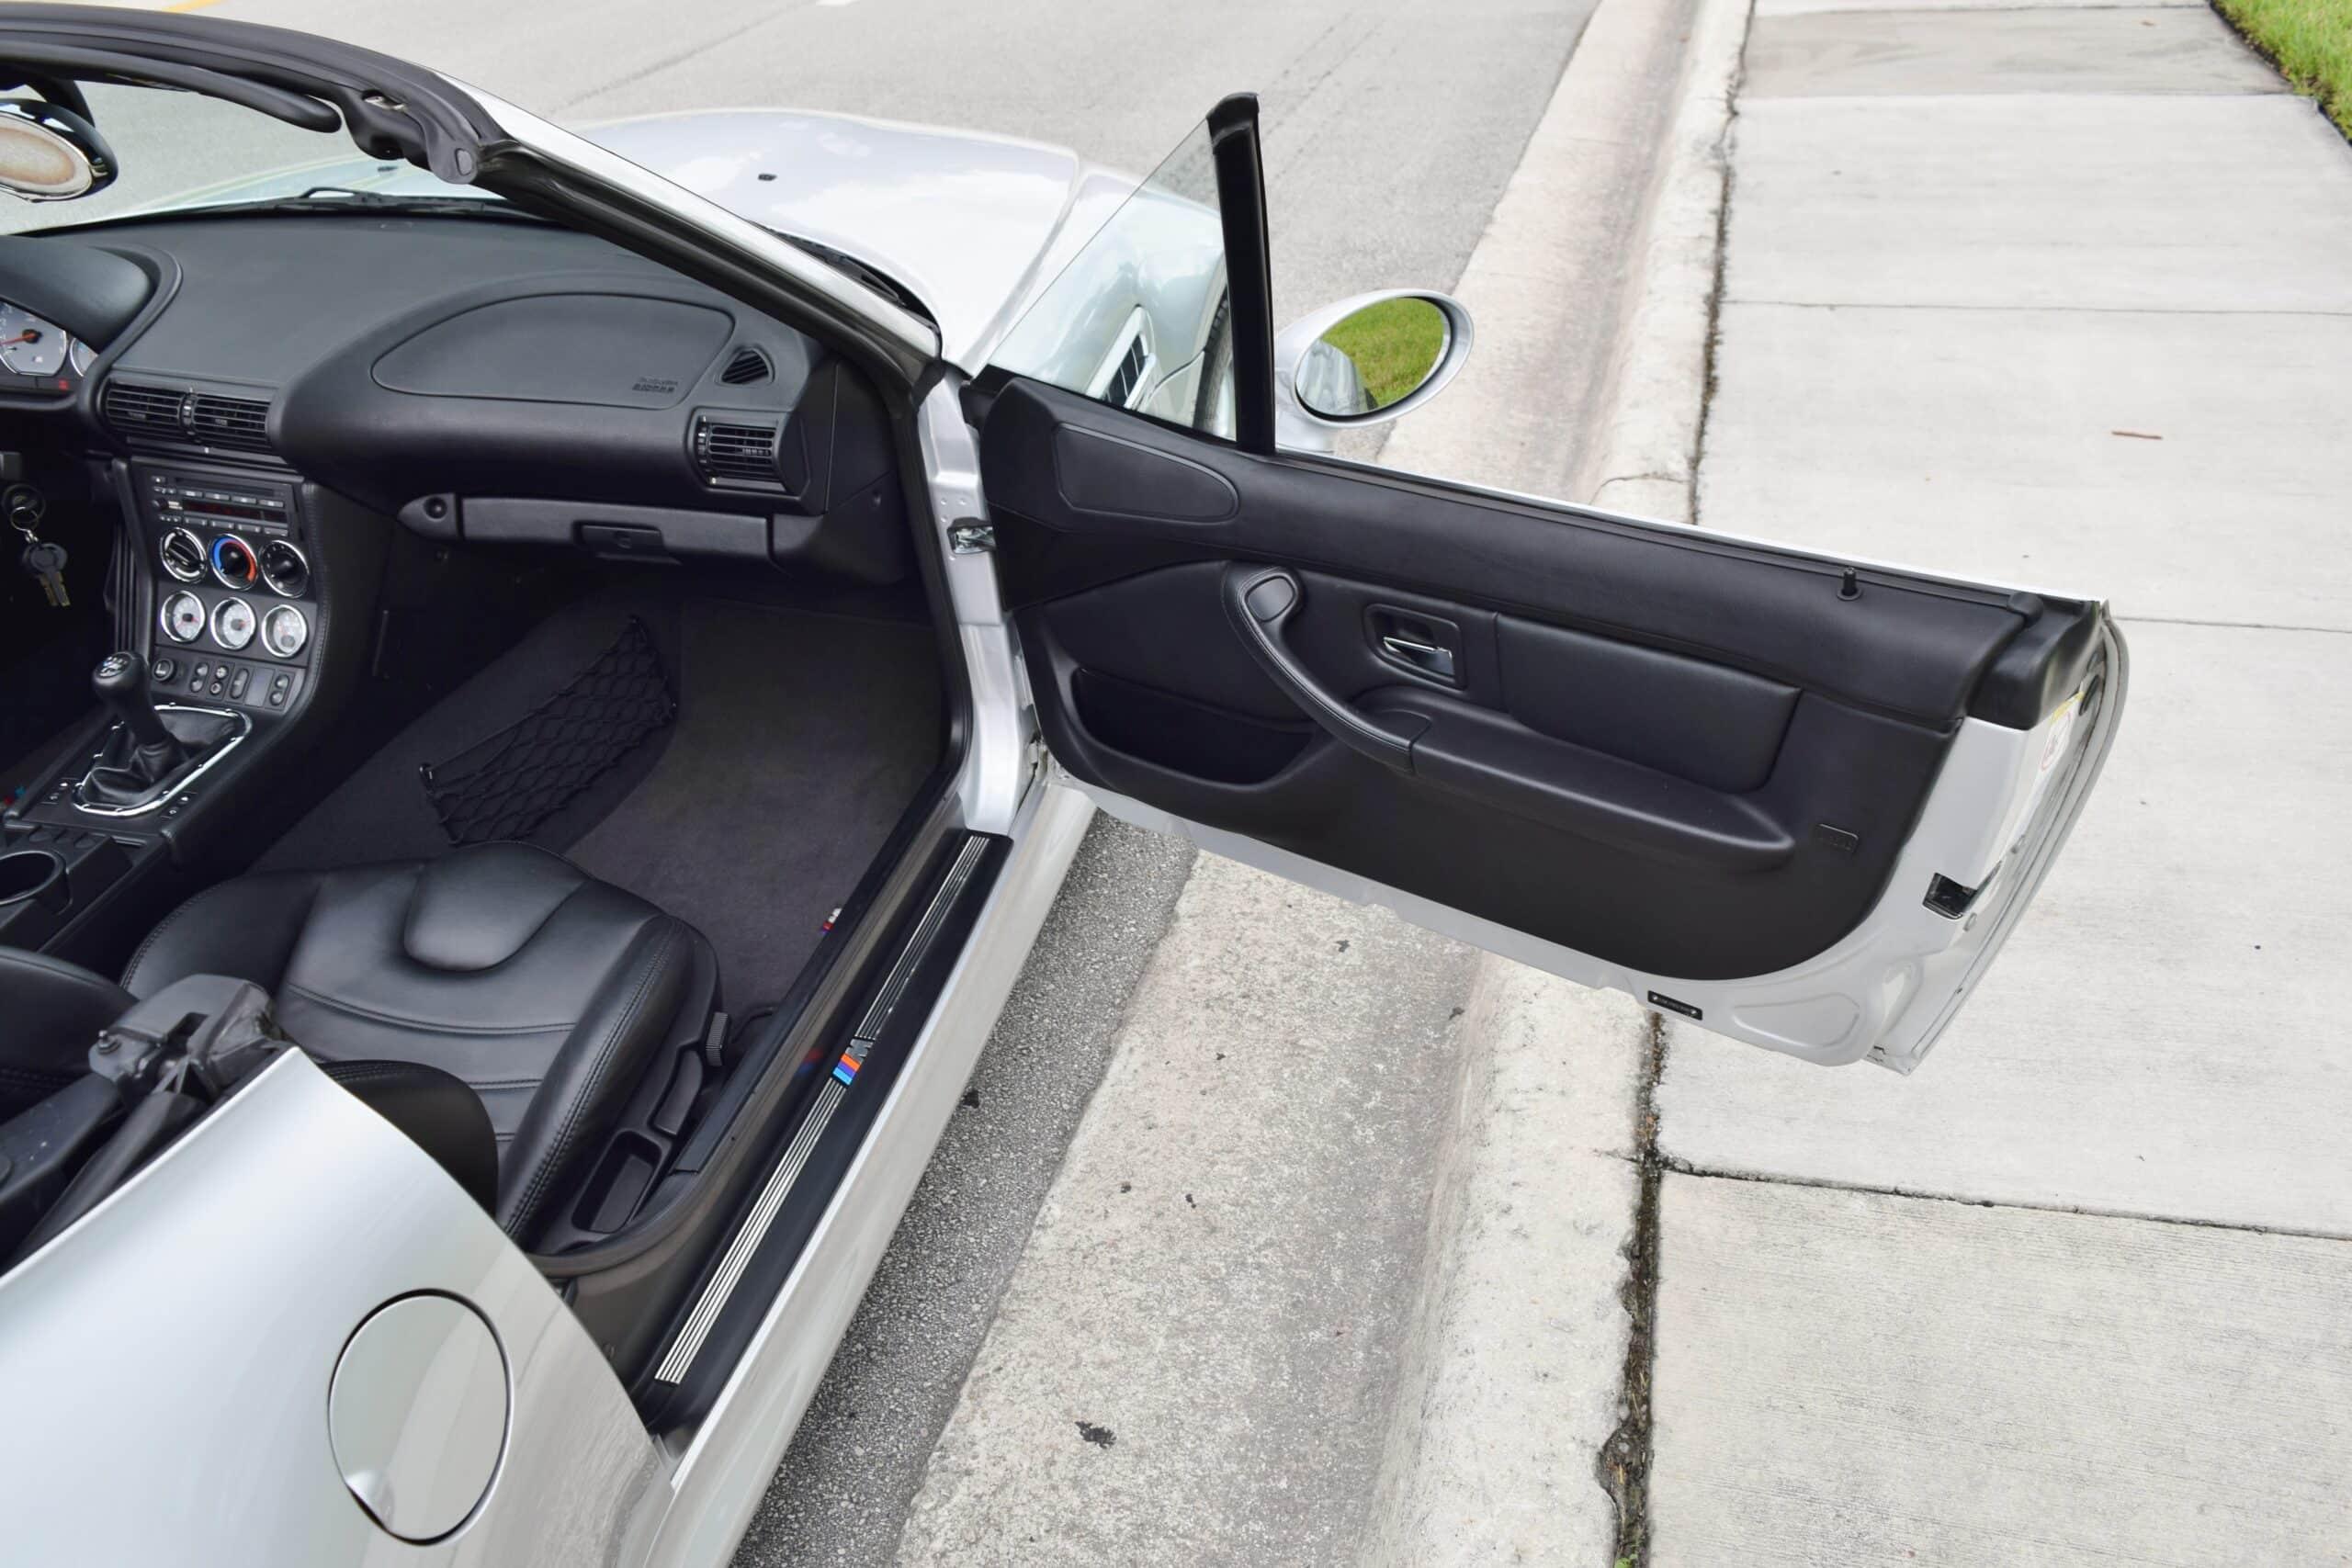 2002 BMW Z3M Roadster ALL Original Paint -ONLY 43K MILES- LAST YEAR Z3M- S54 – Original window sticker